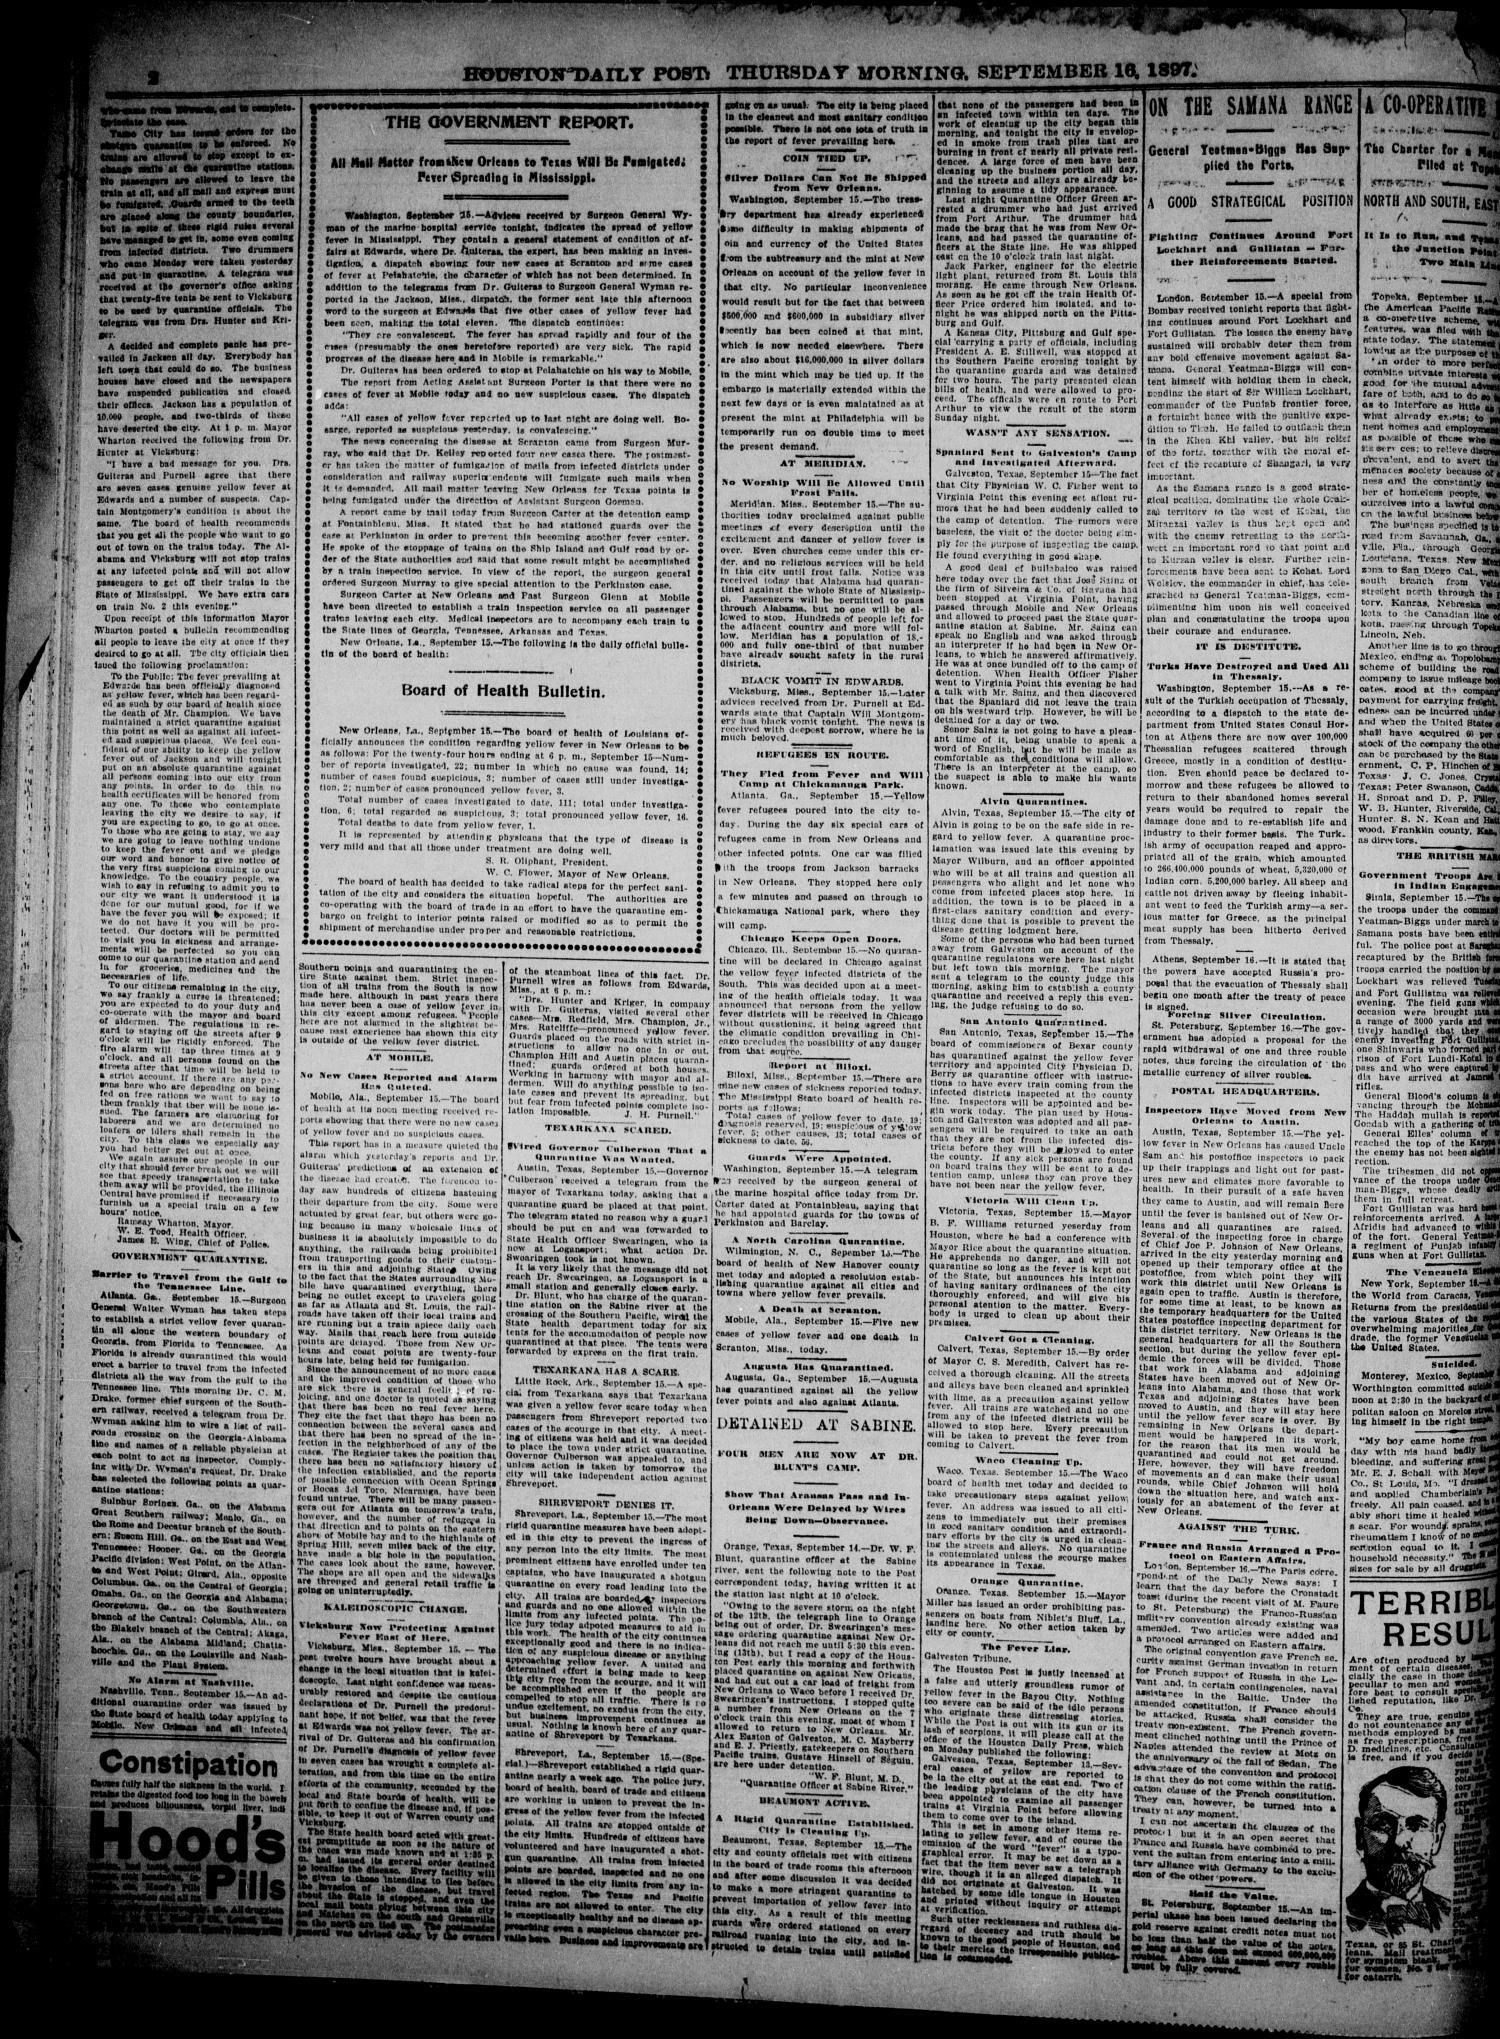 The Houston Daily Post (Houston, Tex.), Vol. THIRTEENTH YEAR, No ...